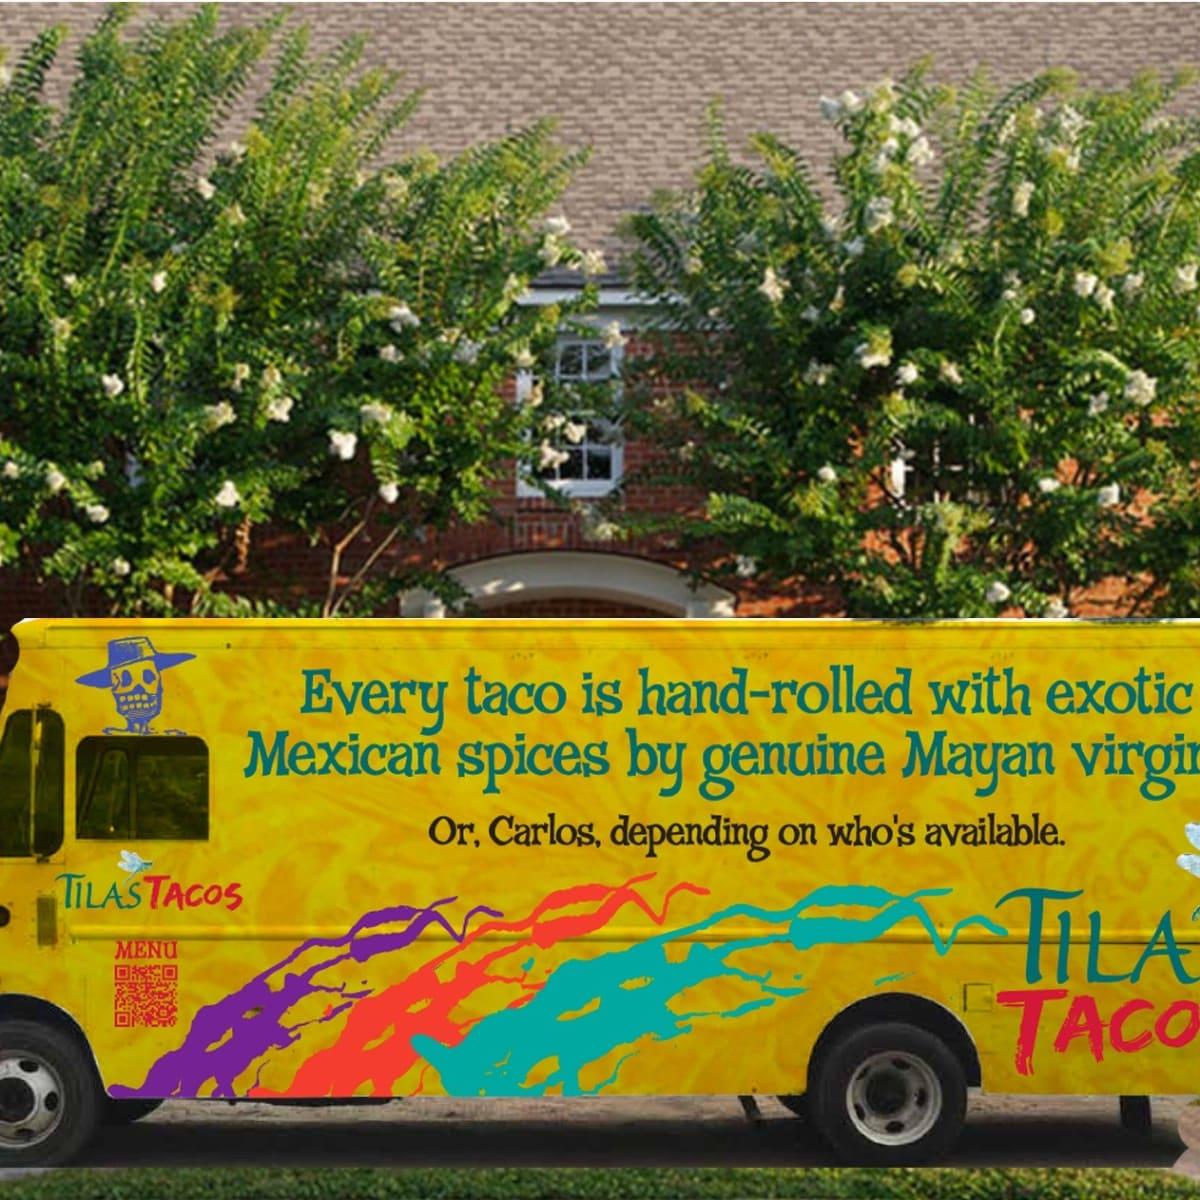 Tila's taco truck